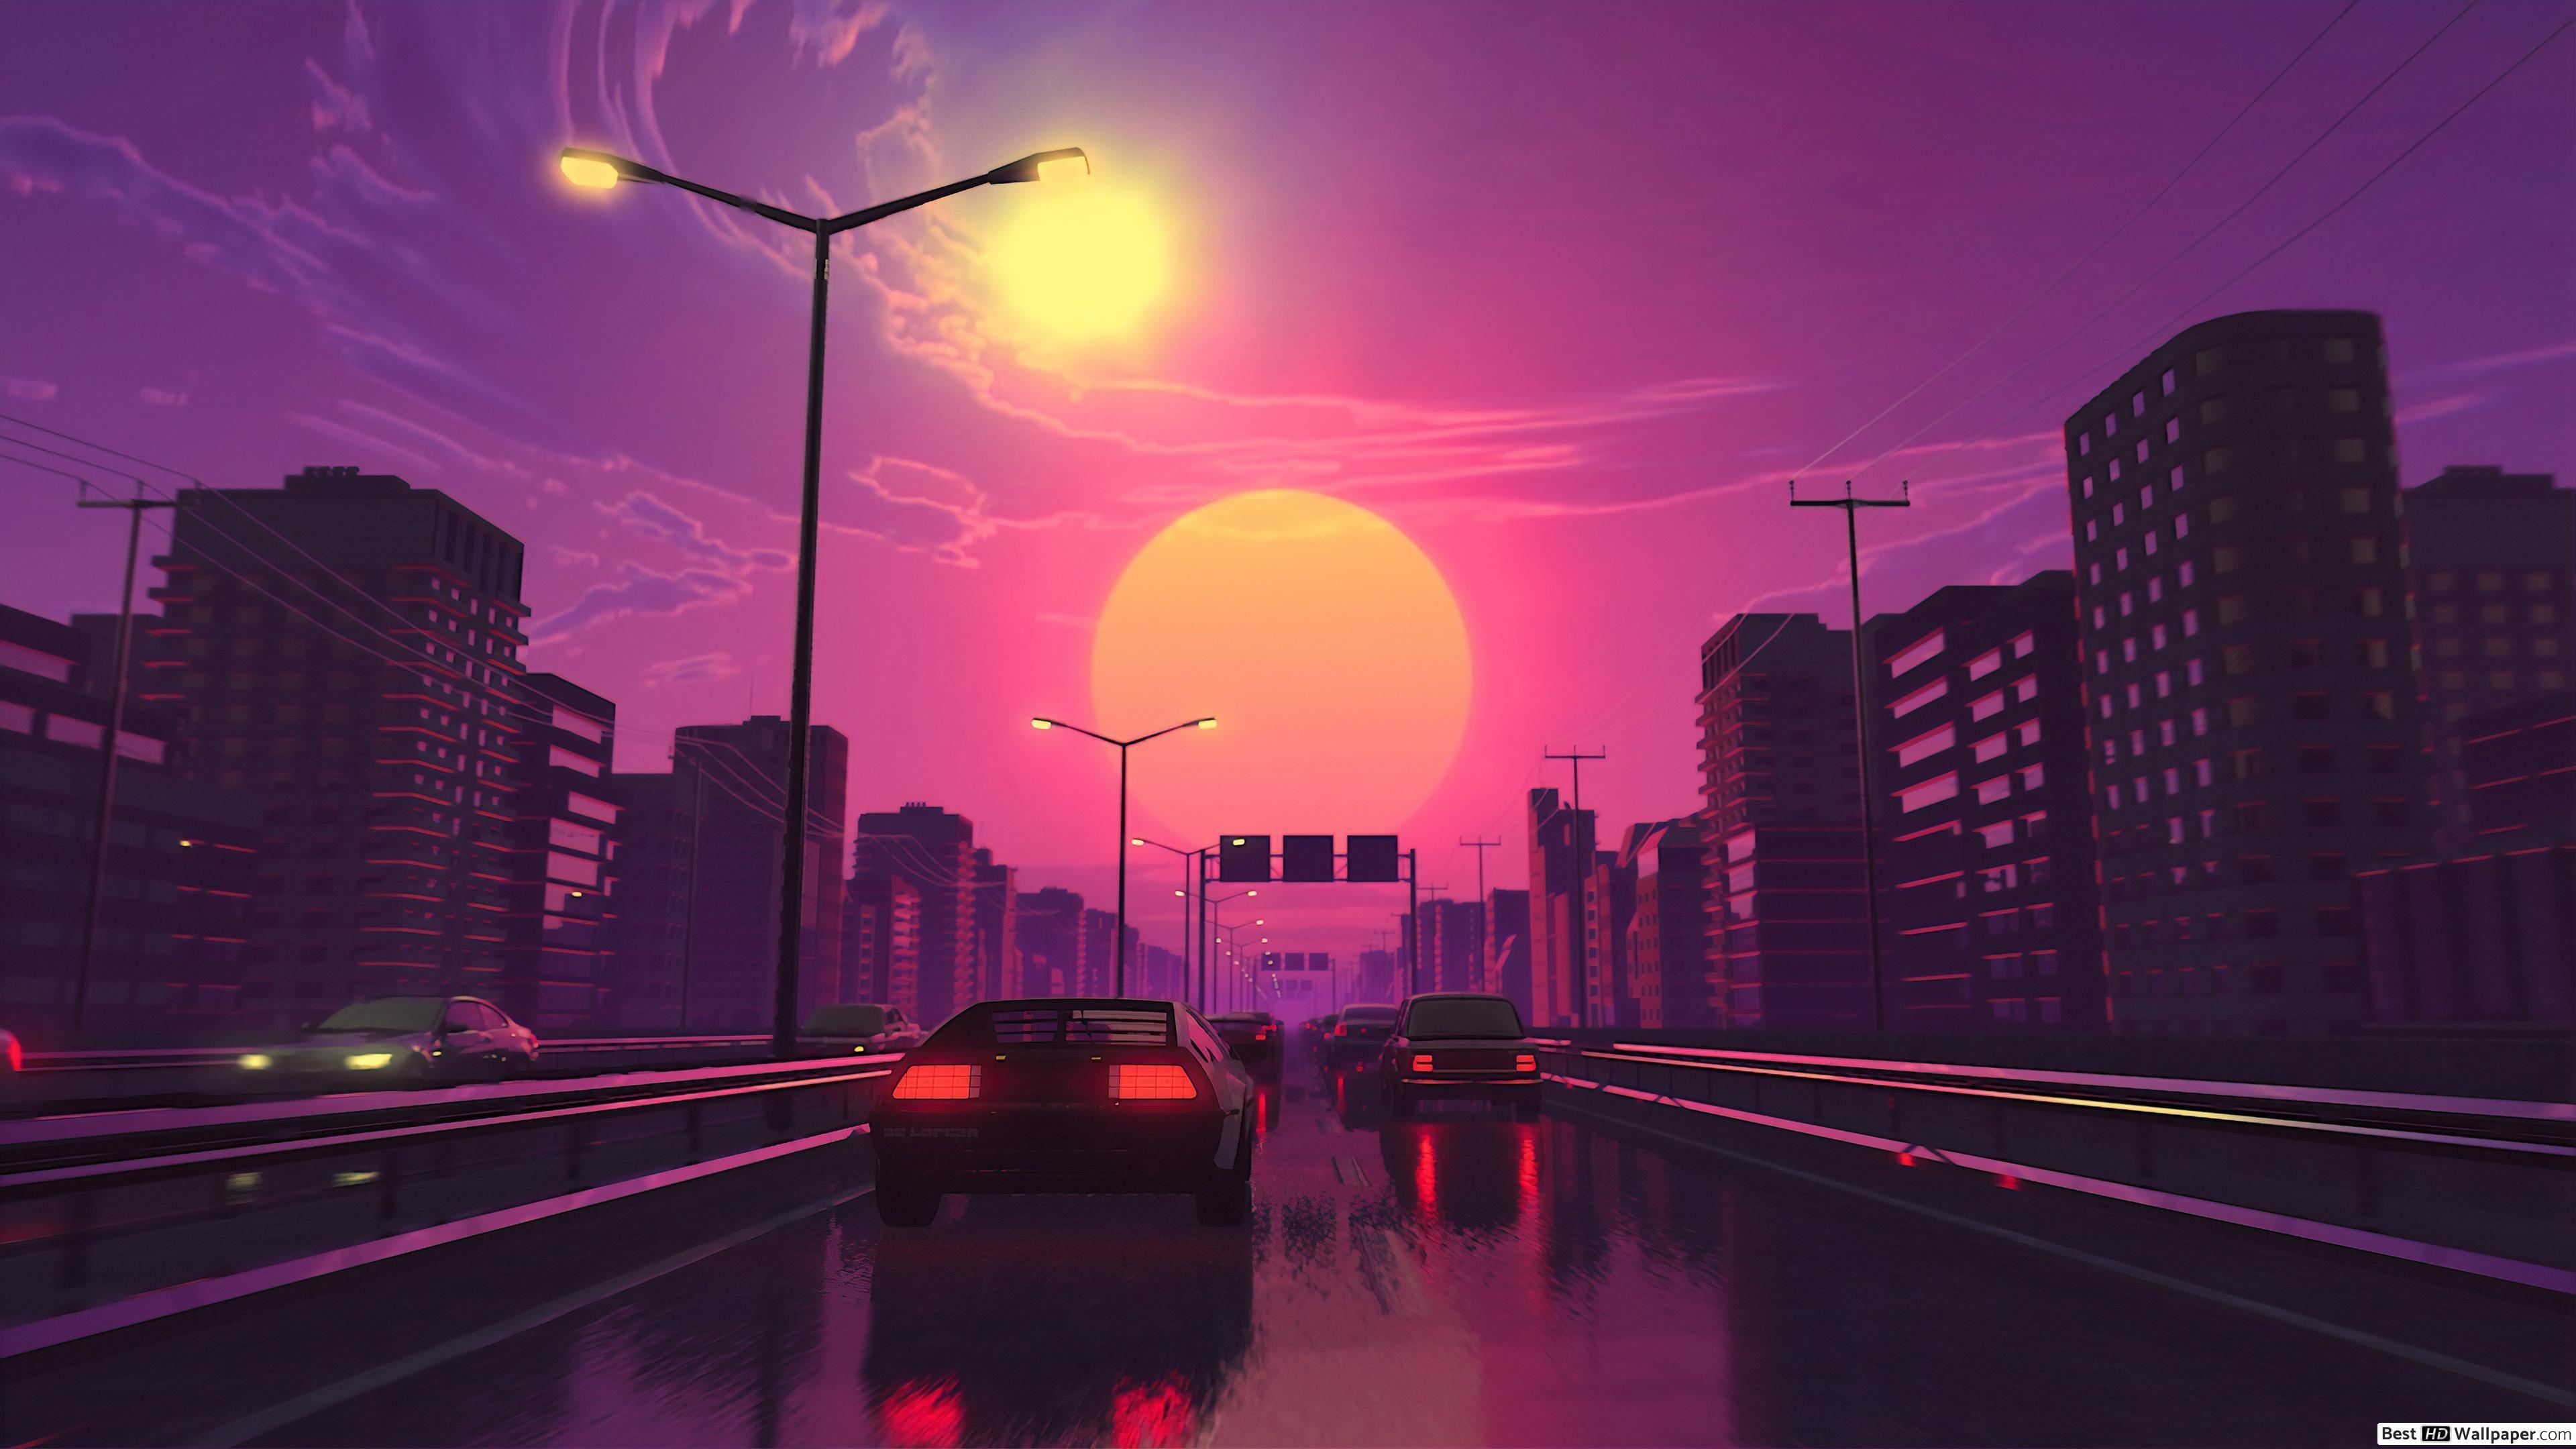 Retro City Wallpapers   Top Retro City Backgrounds 3840x2160